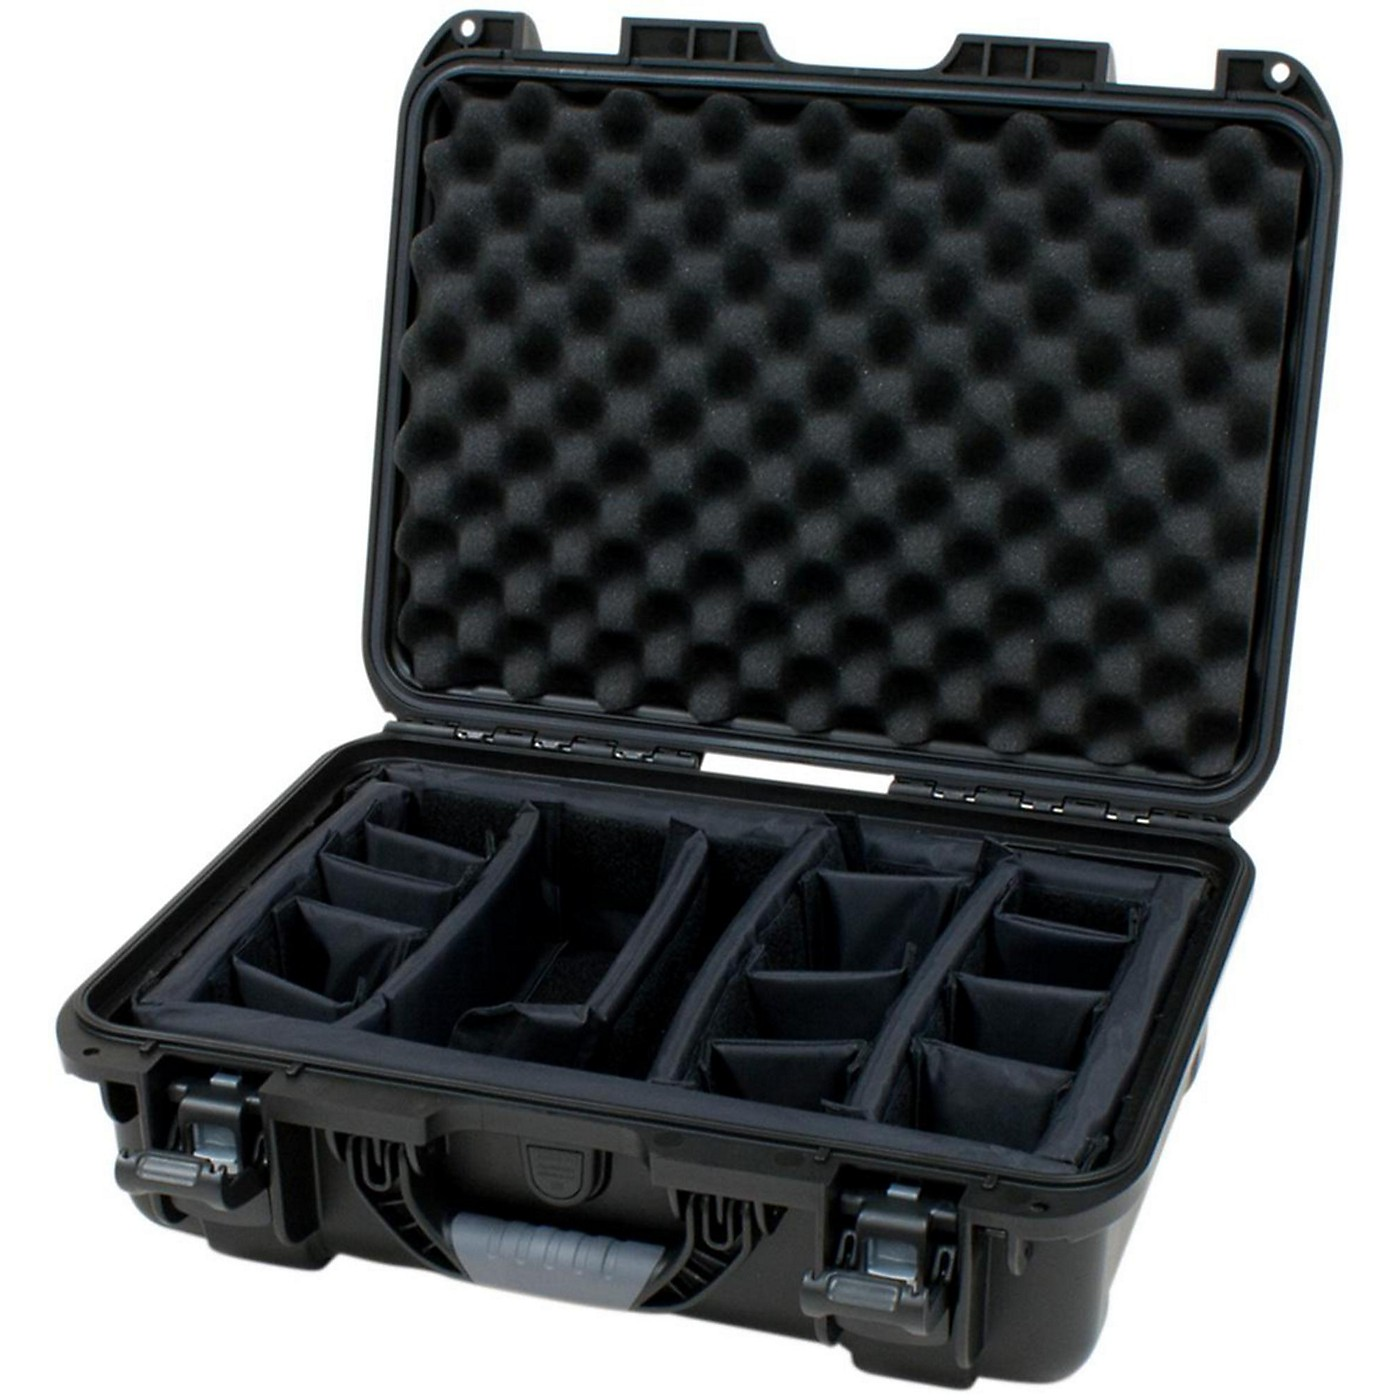 Gator GU-1711-06-WPDV Waterproof Injection Molded Case thumbnail